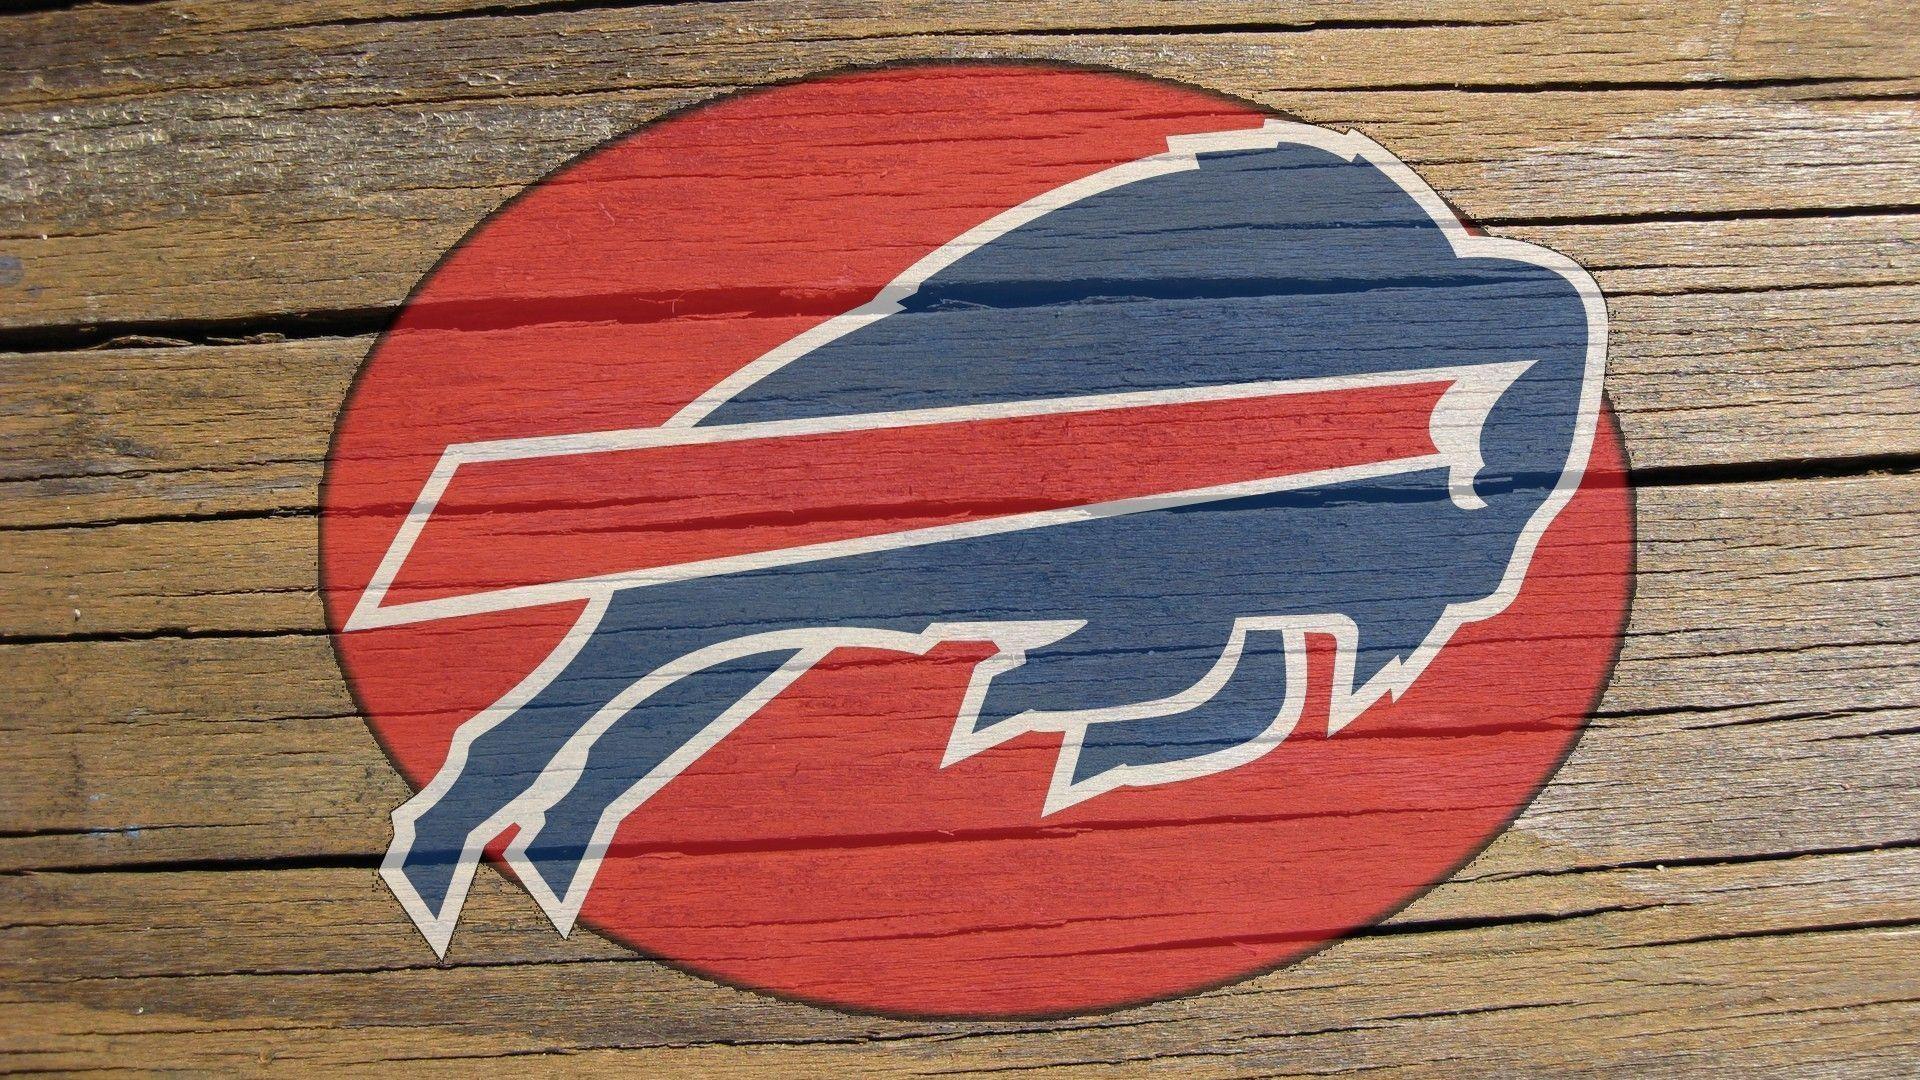 Buffalo Bills Wallpaper Screensaver – High Quality HDQ Cover .